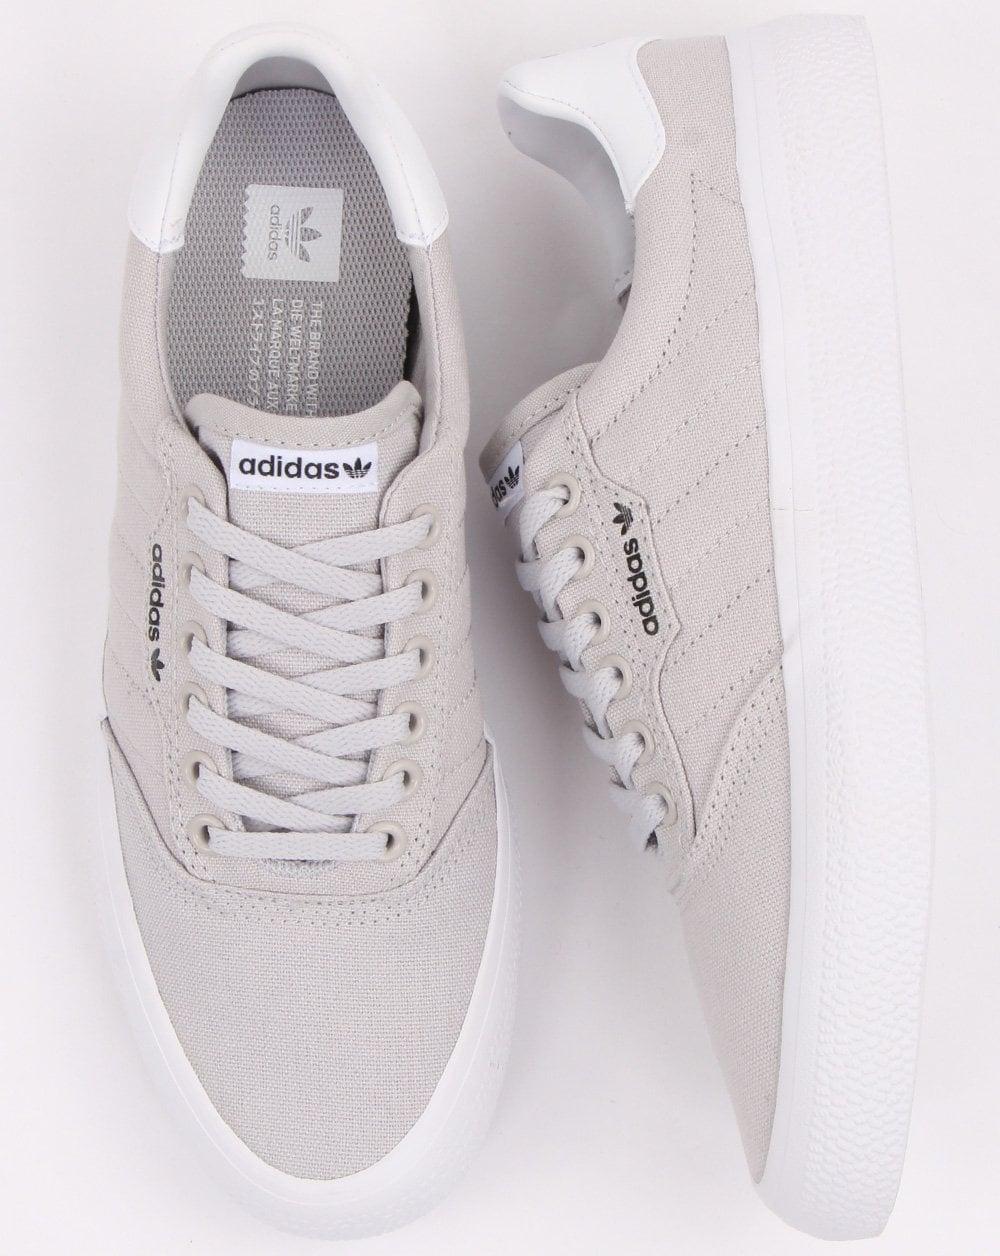 Adidas 3mc Trainers Light Solid Grey